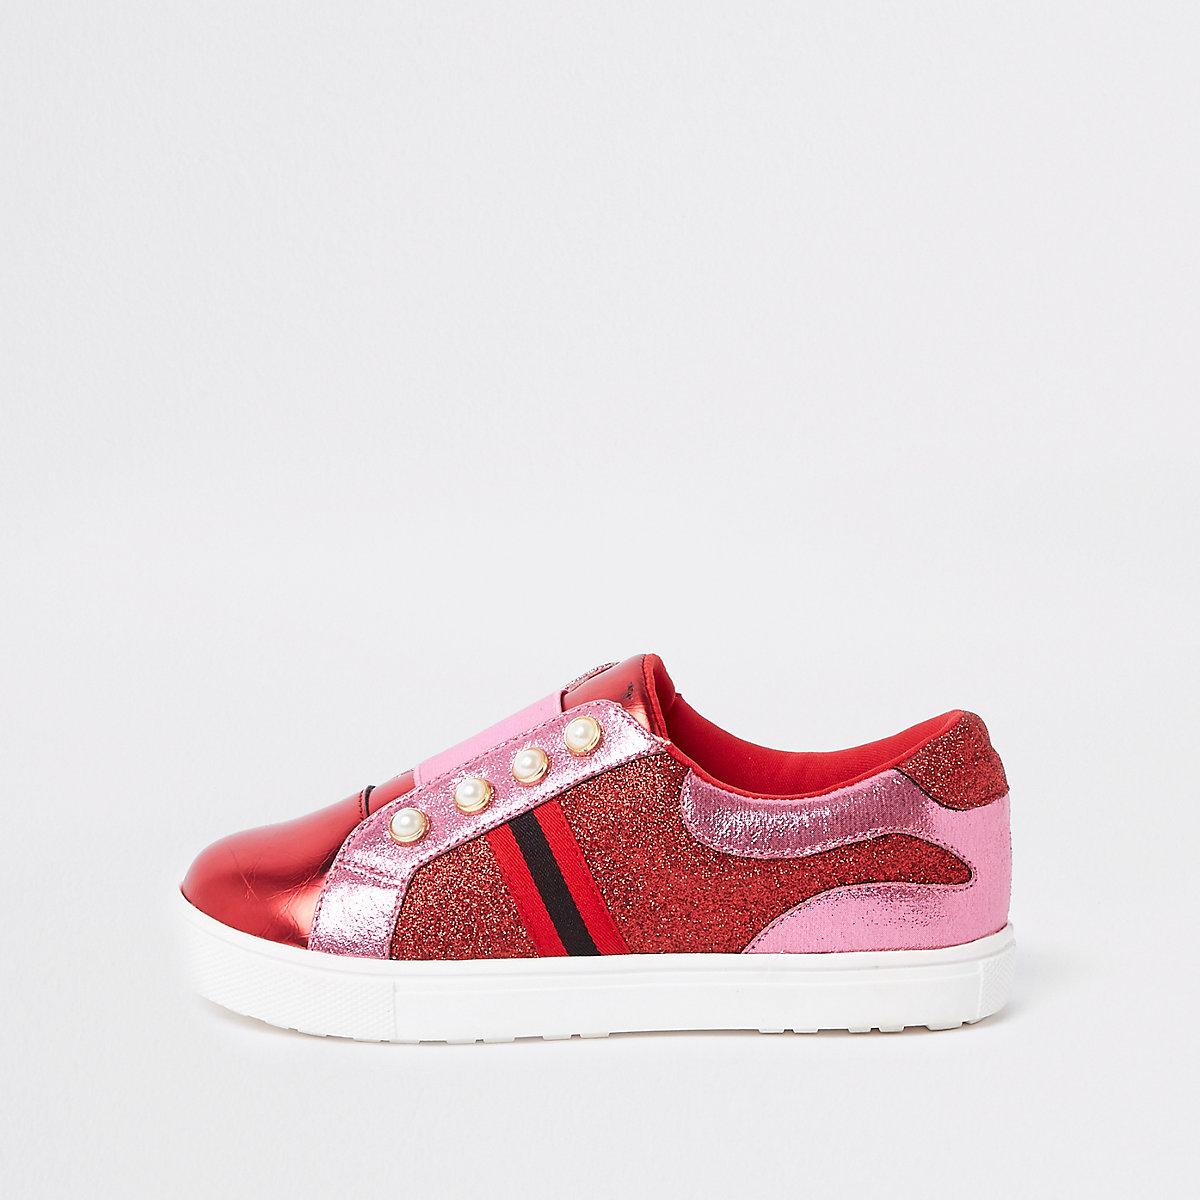 Girls pink red pearl glitter plimsolls